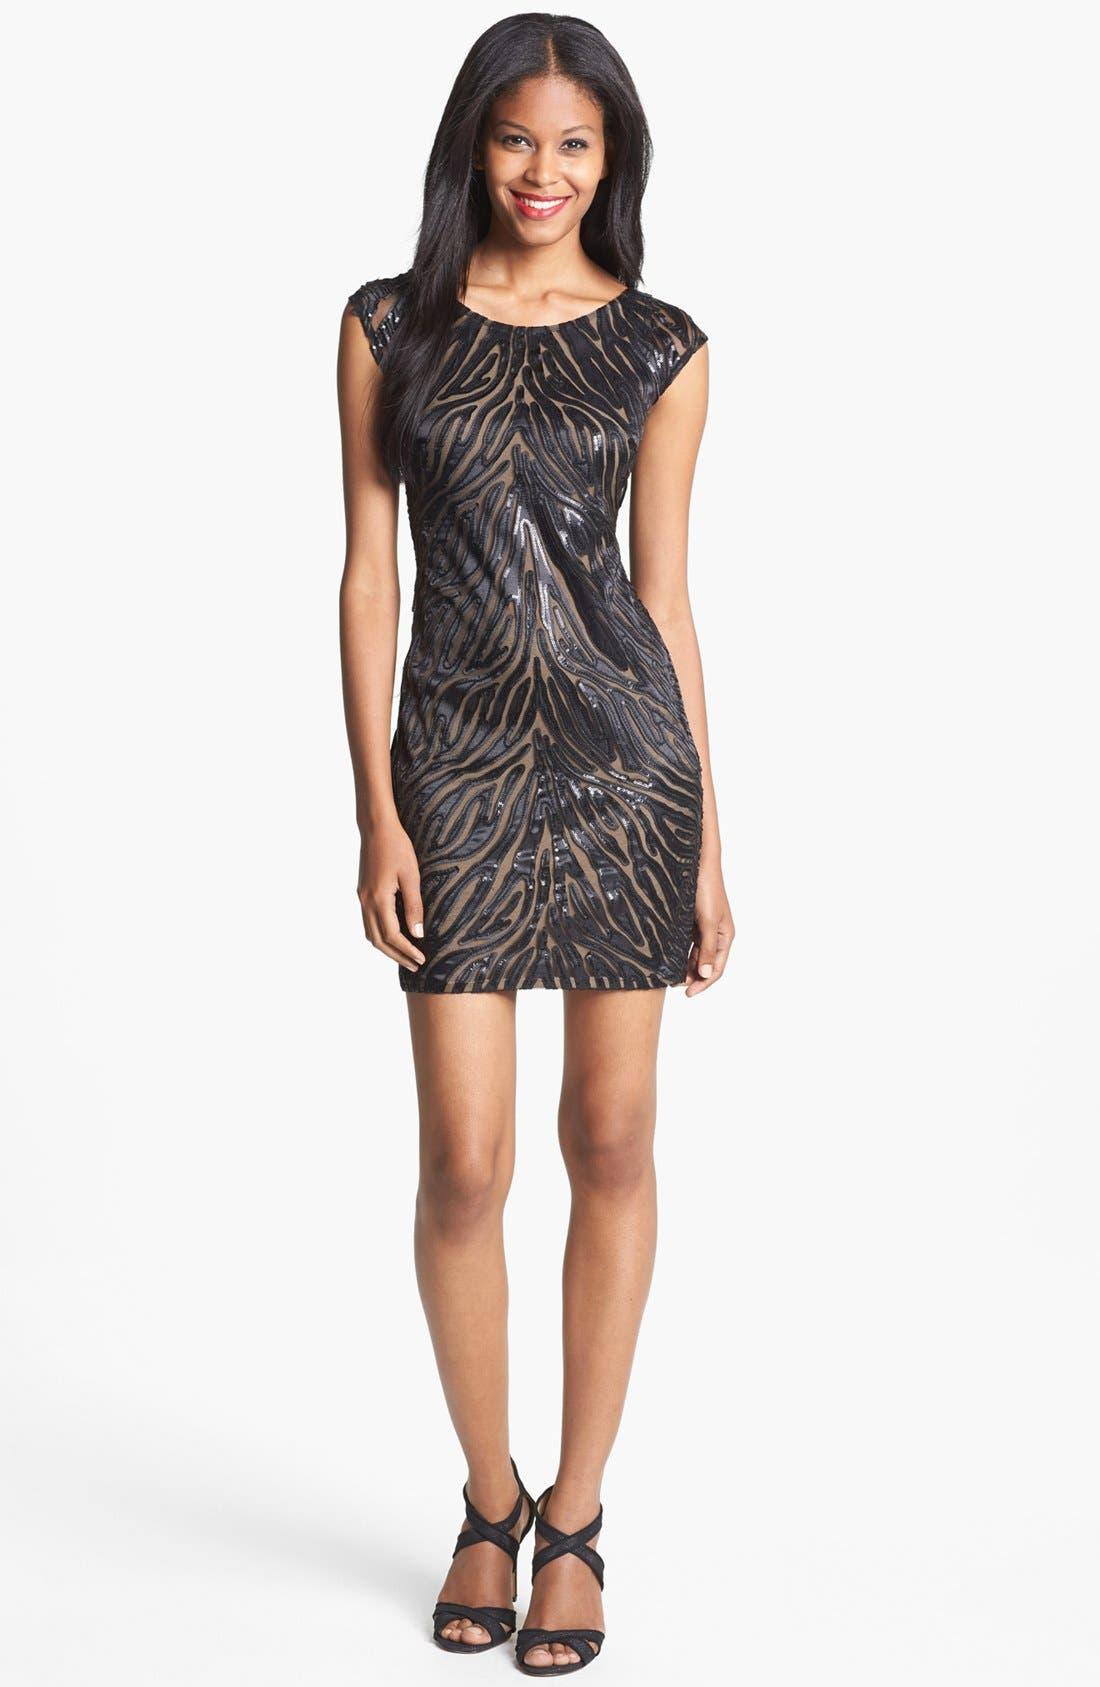 Alternate Image 1 Selected - B44 Dressed by Bailey 44 'Stranger of Desire' Embellished Sheath Dress